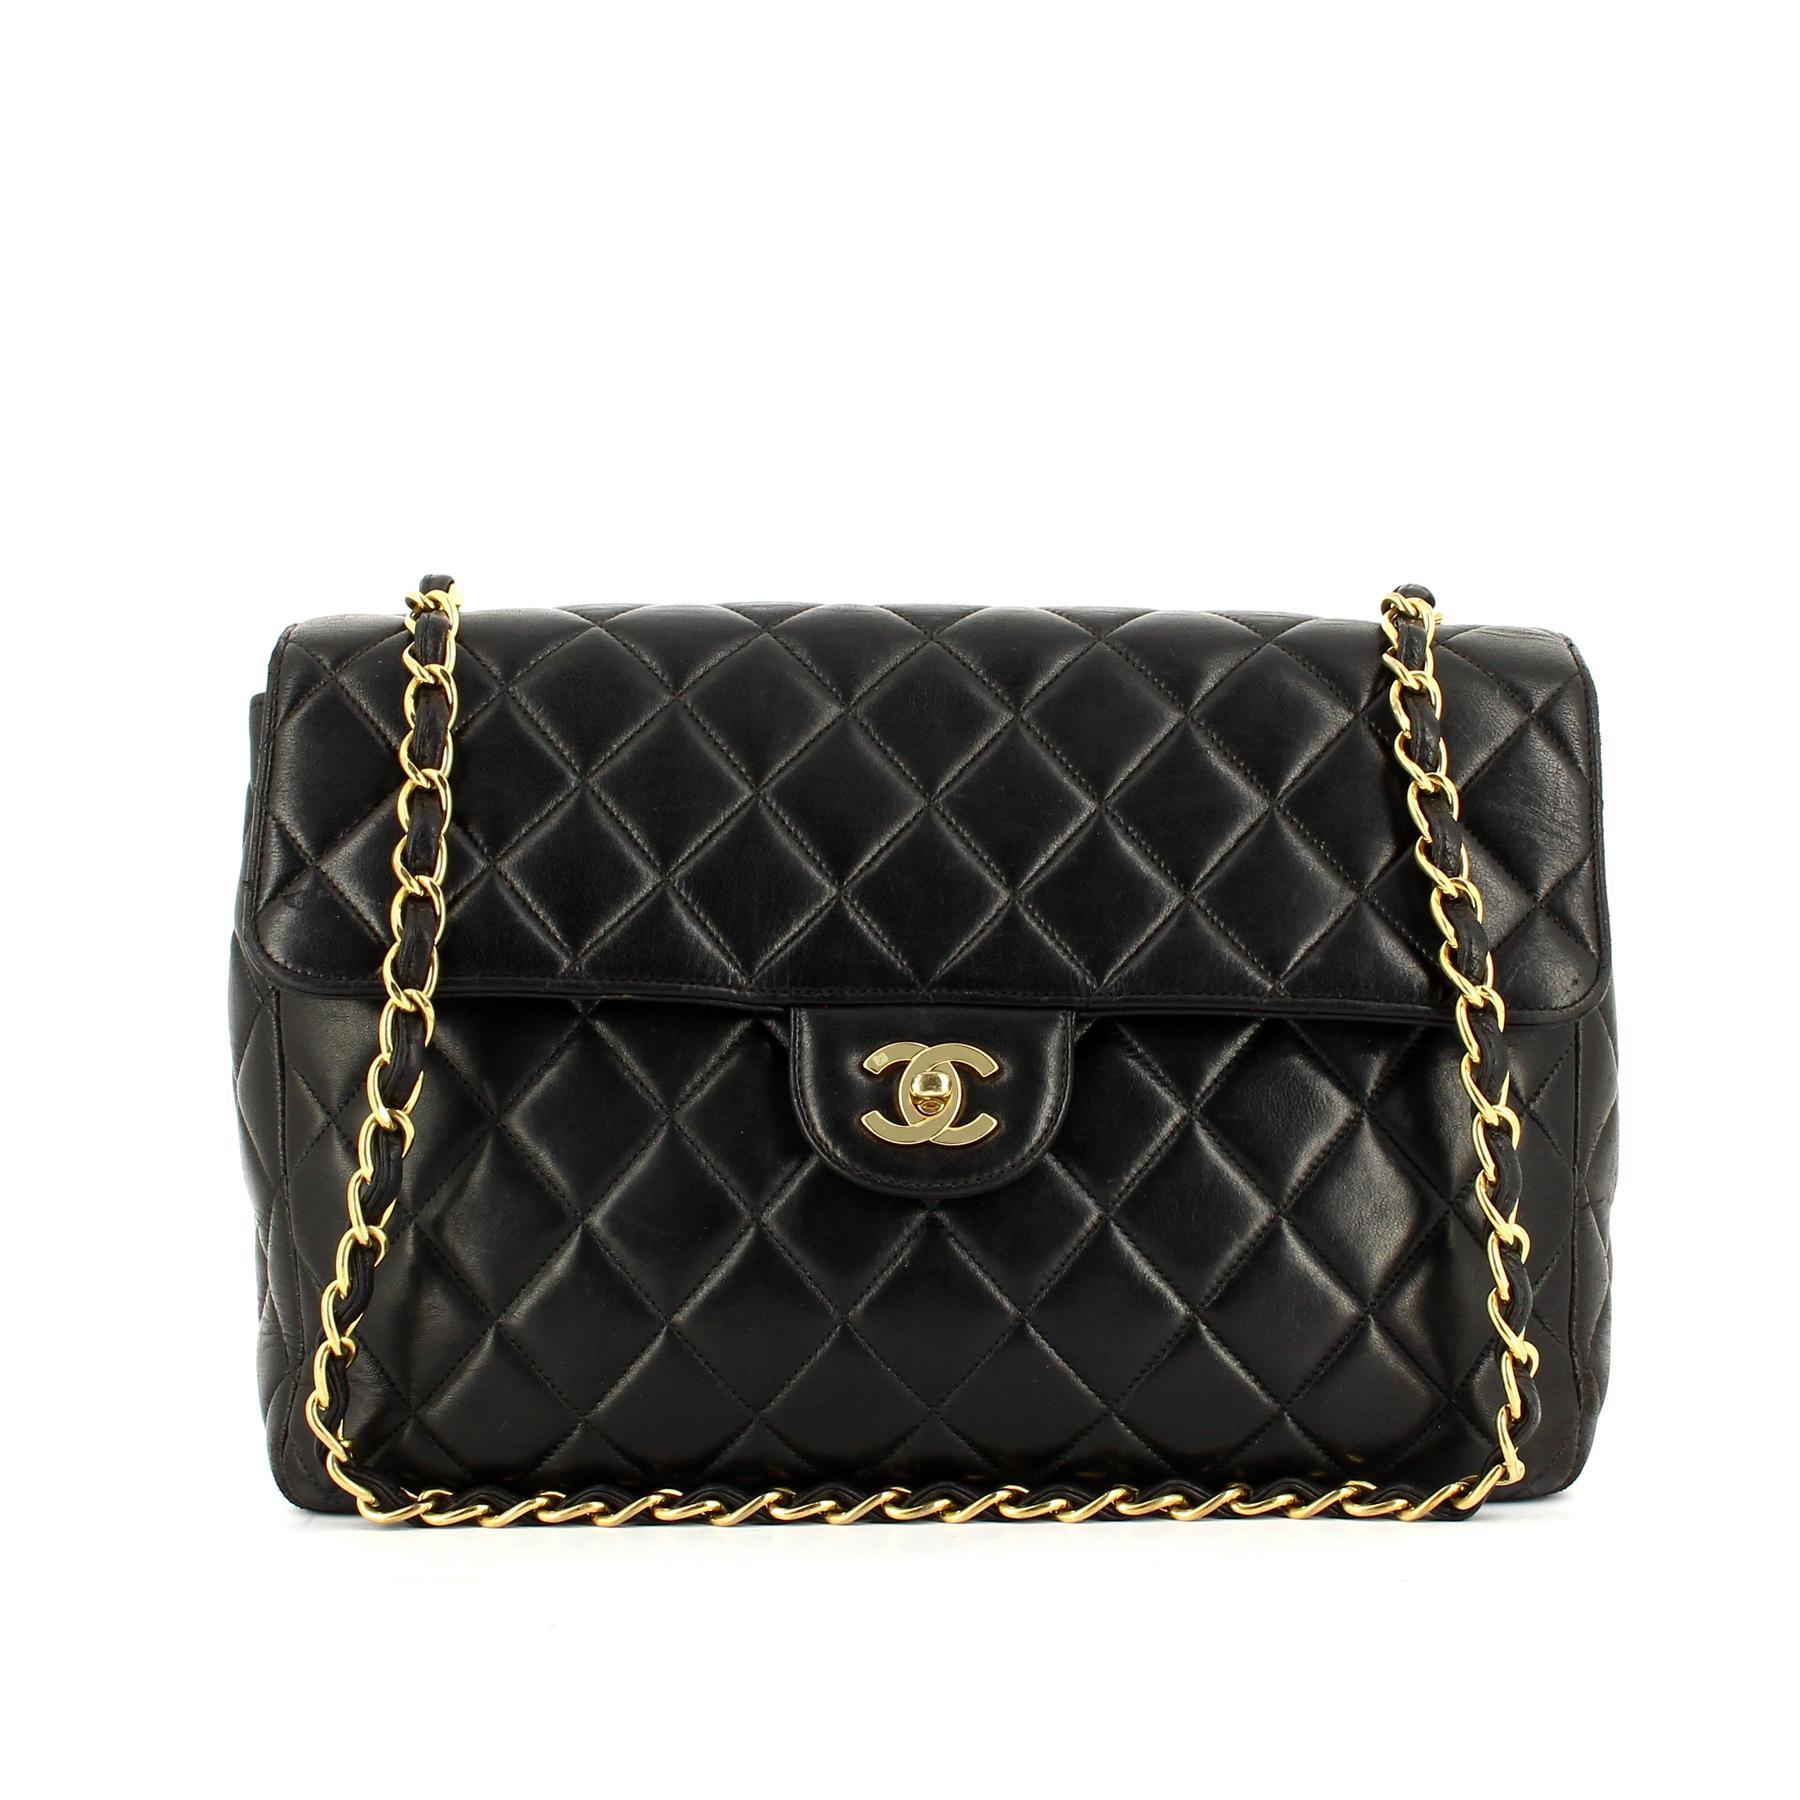 Chanel Sac Sac Chanel Timeless Noir Cuir Femme